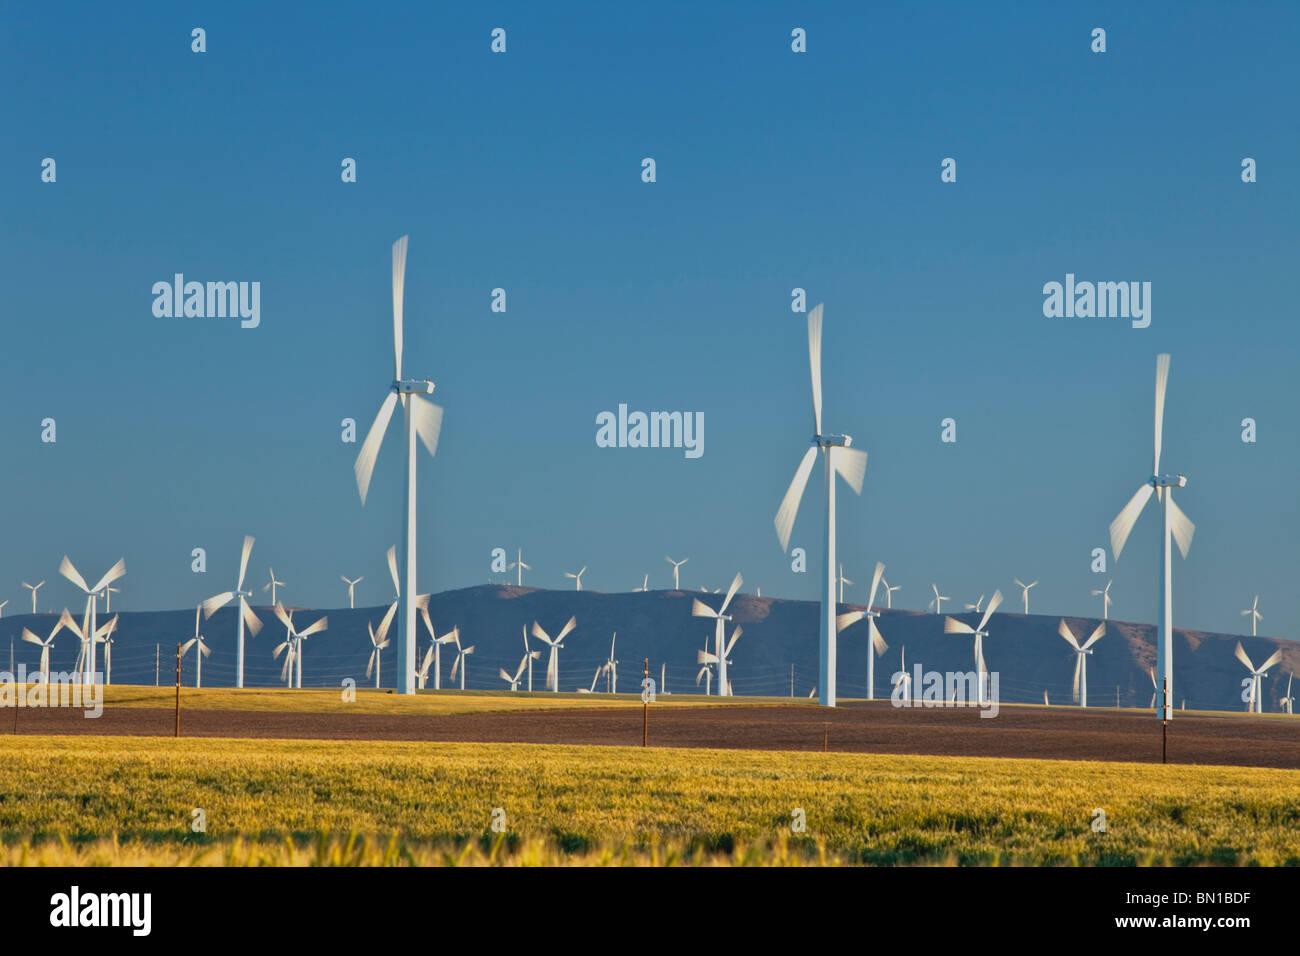 Wind farm, maturing wheat & fallow fields Stock Photo